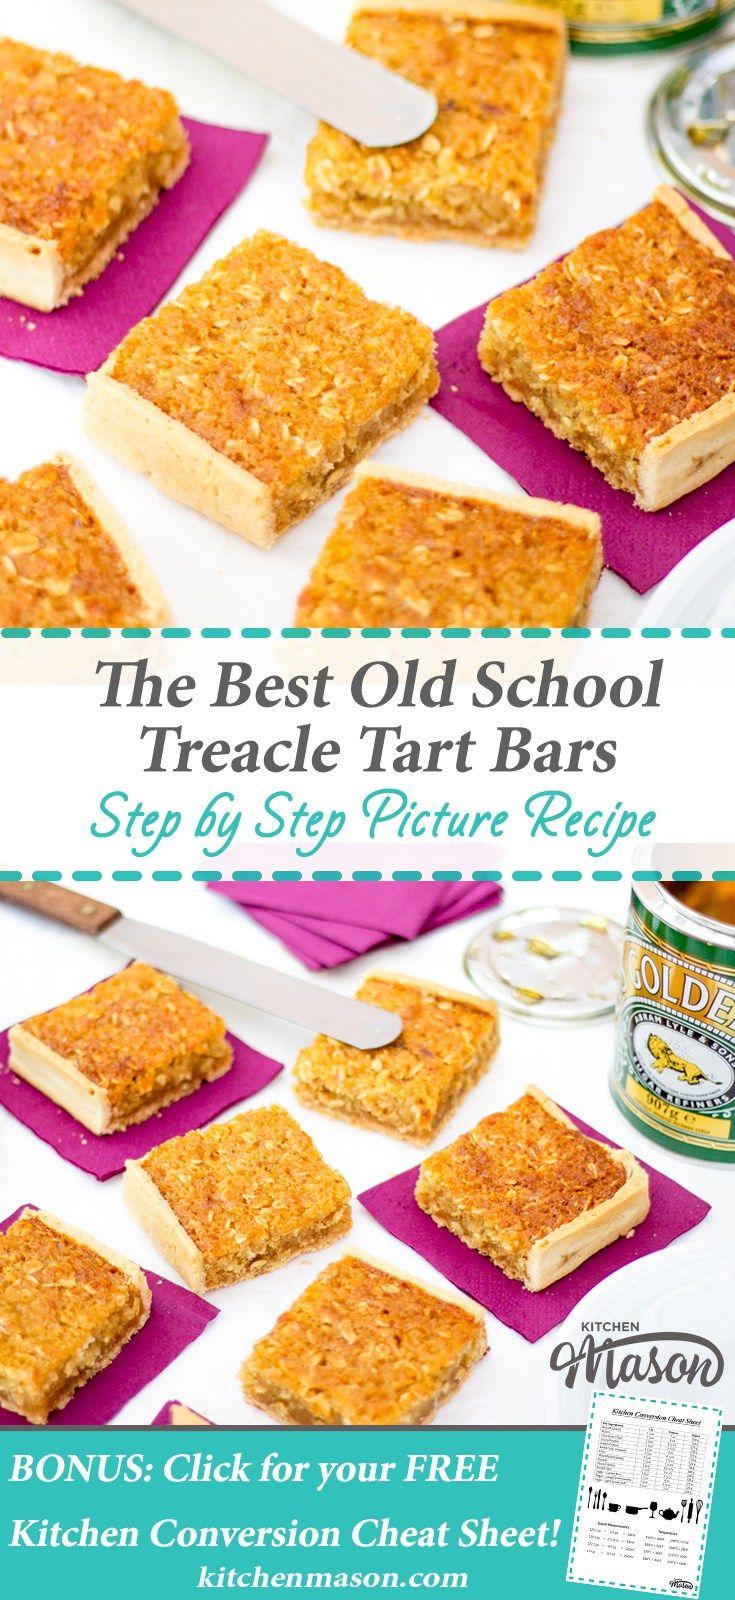 Treacle Tart The Best School Bars Traybake Golden Syrup Treacle Tart Dessert Recipes Easy Dessert Recipes